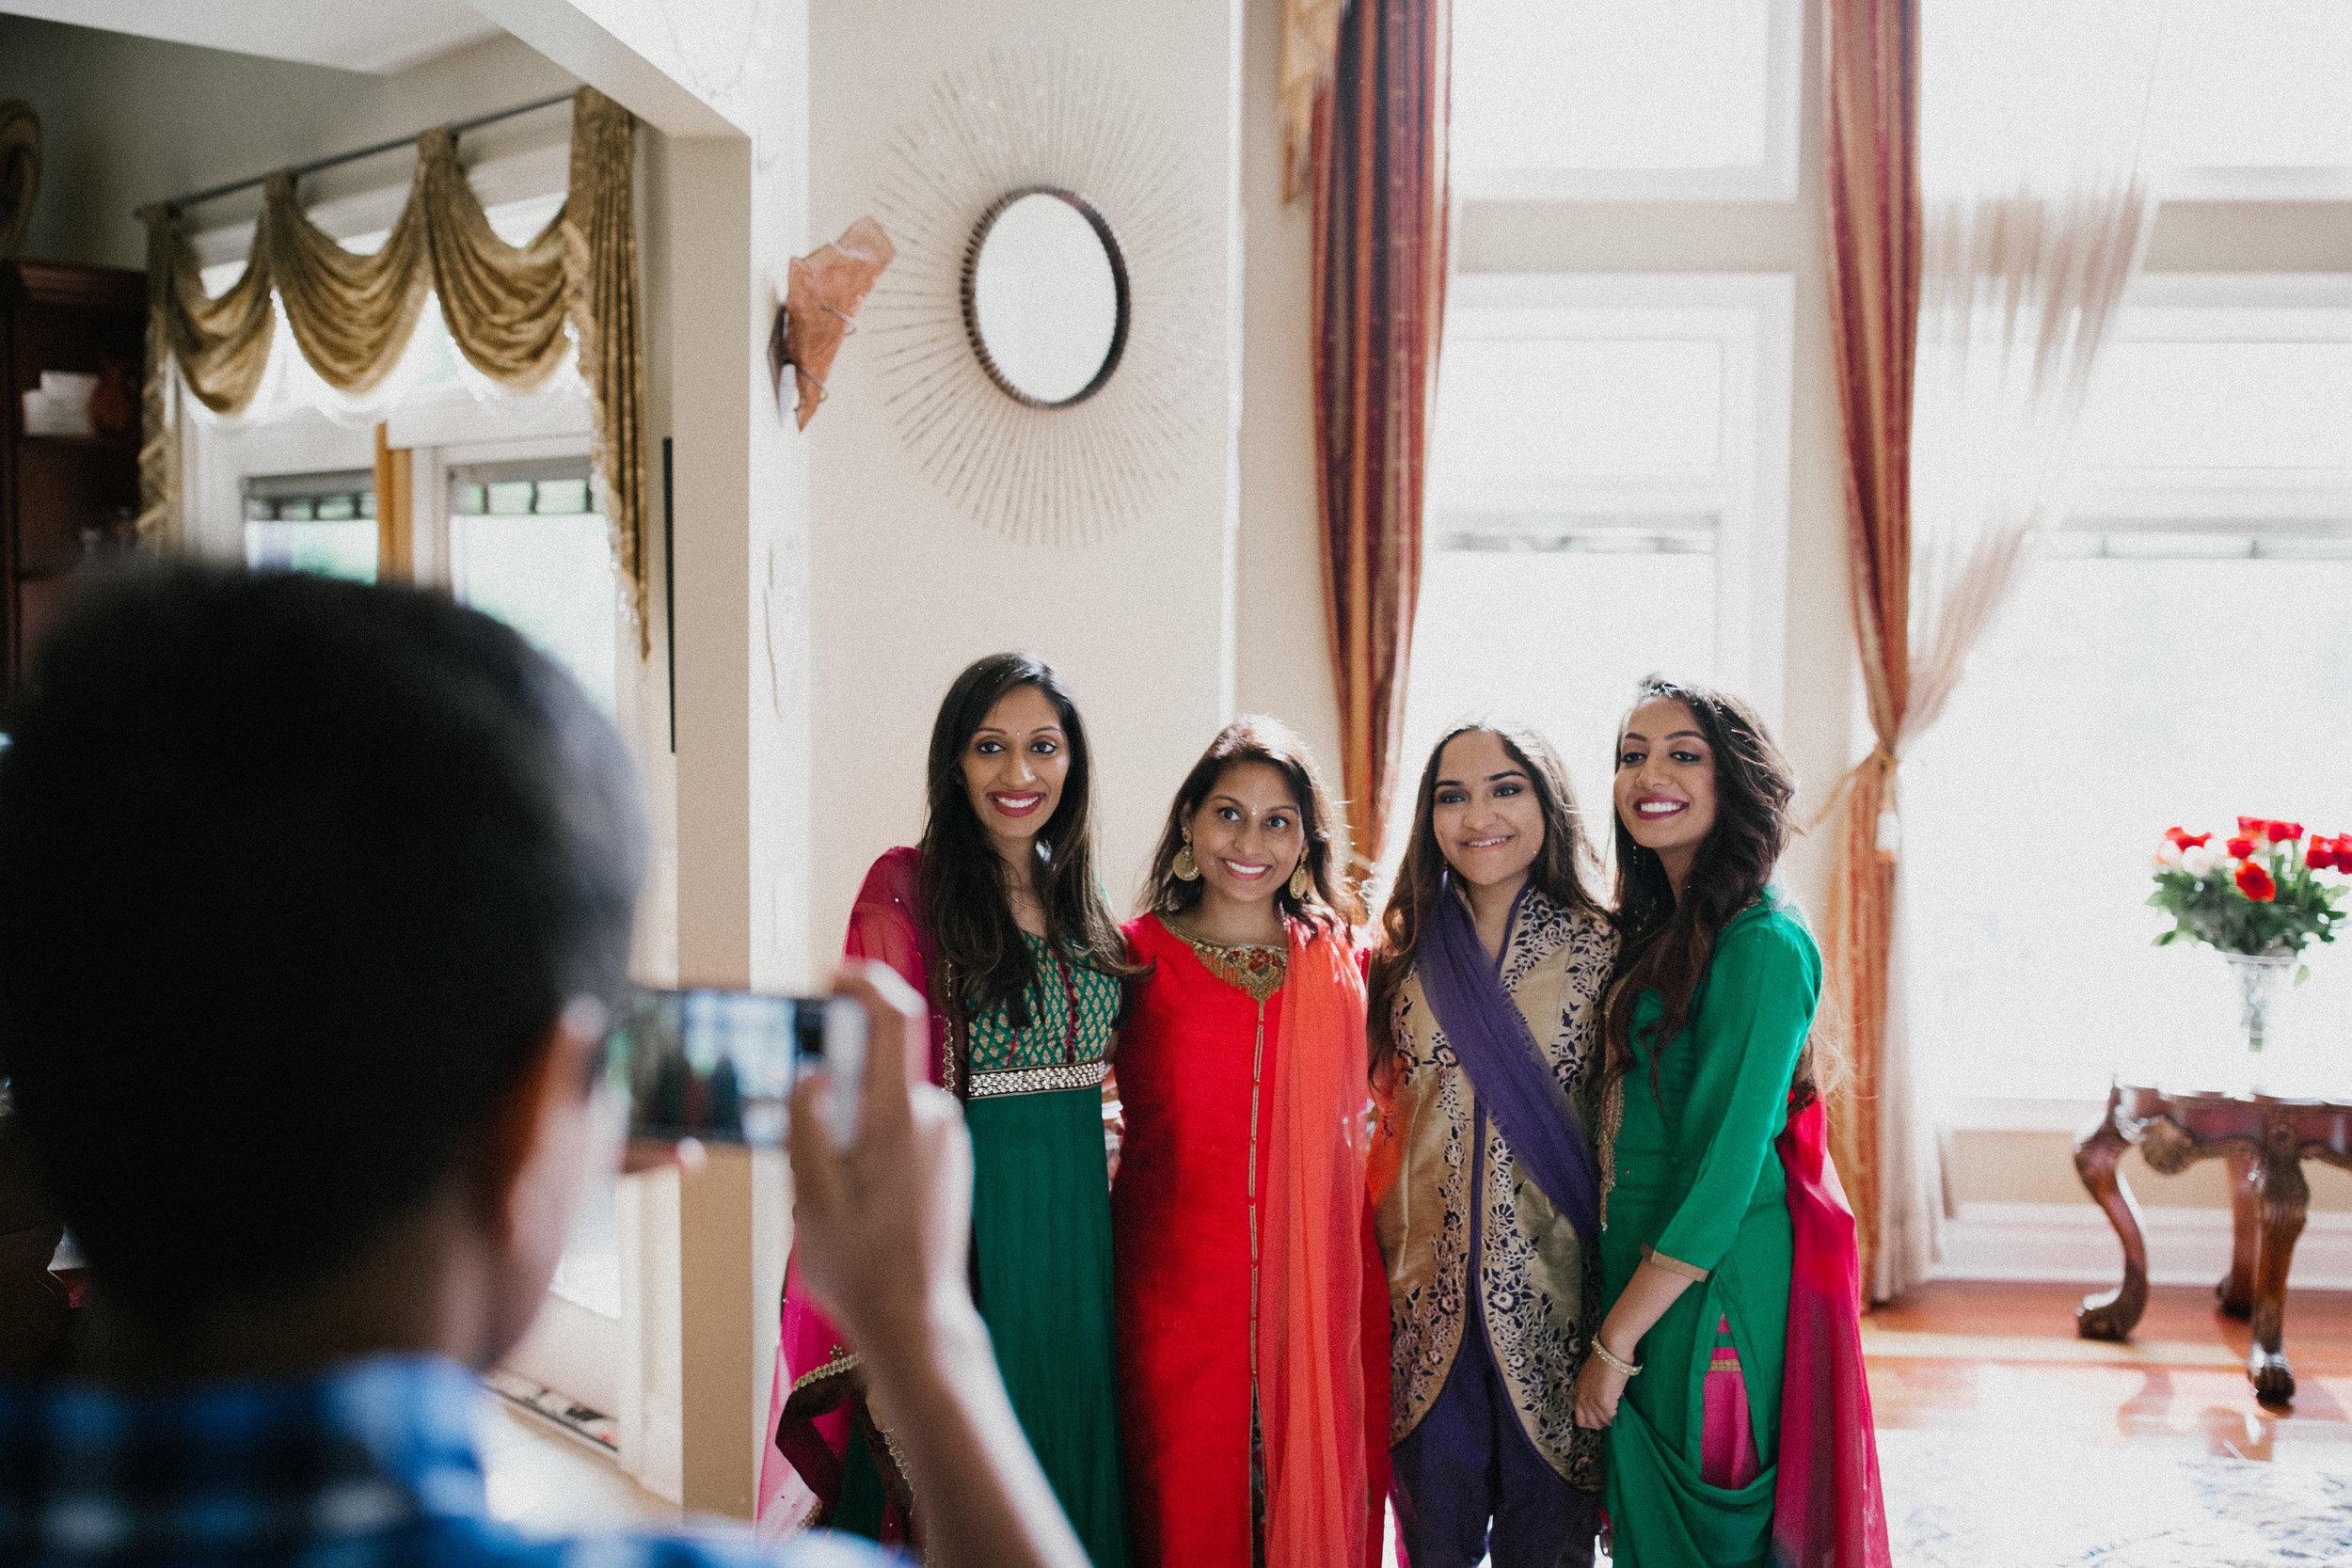 Aparna-Ankit-Patel-Mehndi-Wedding-Photos-0015.jpg